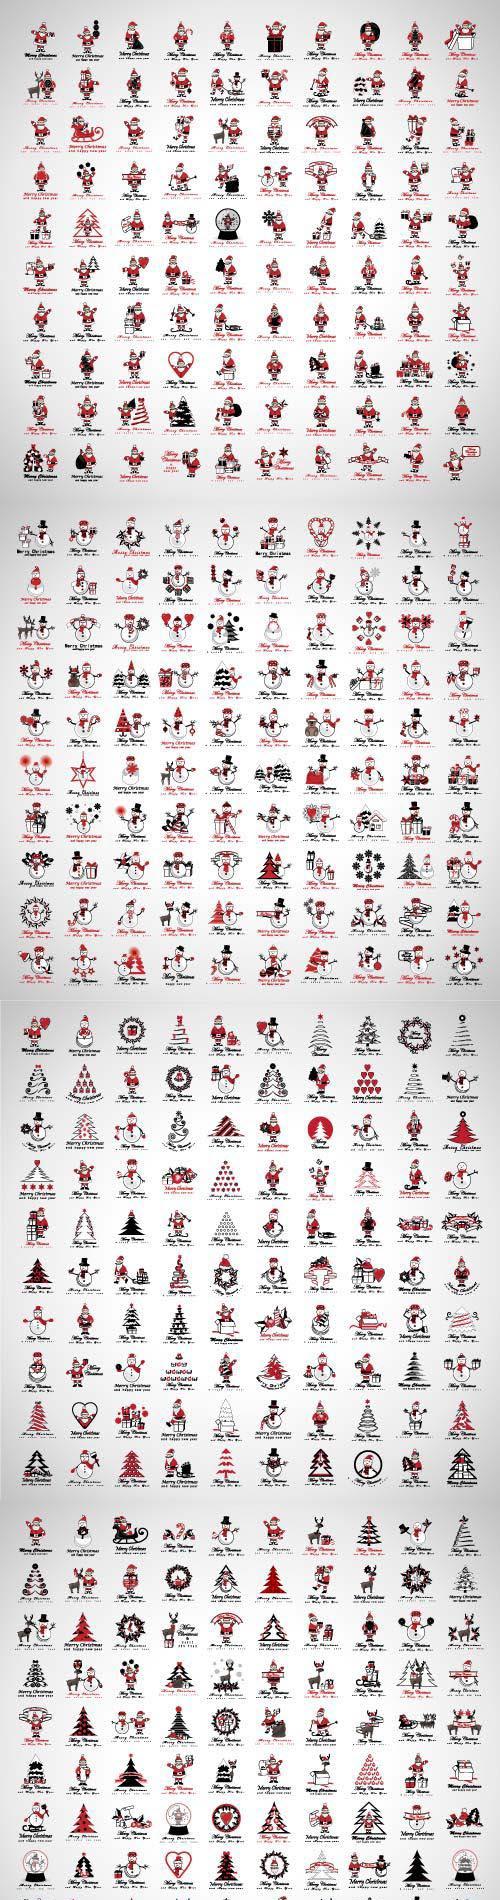 Santa Claus icons and Christmas elements set